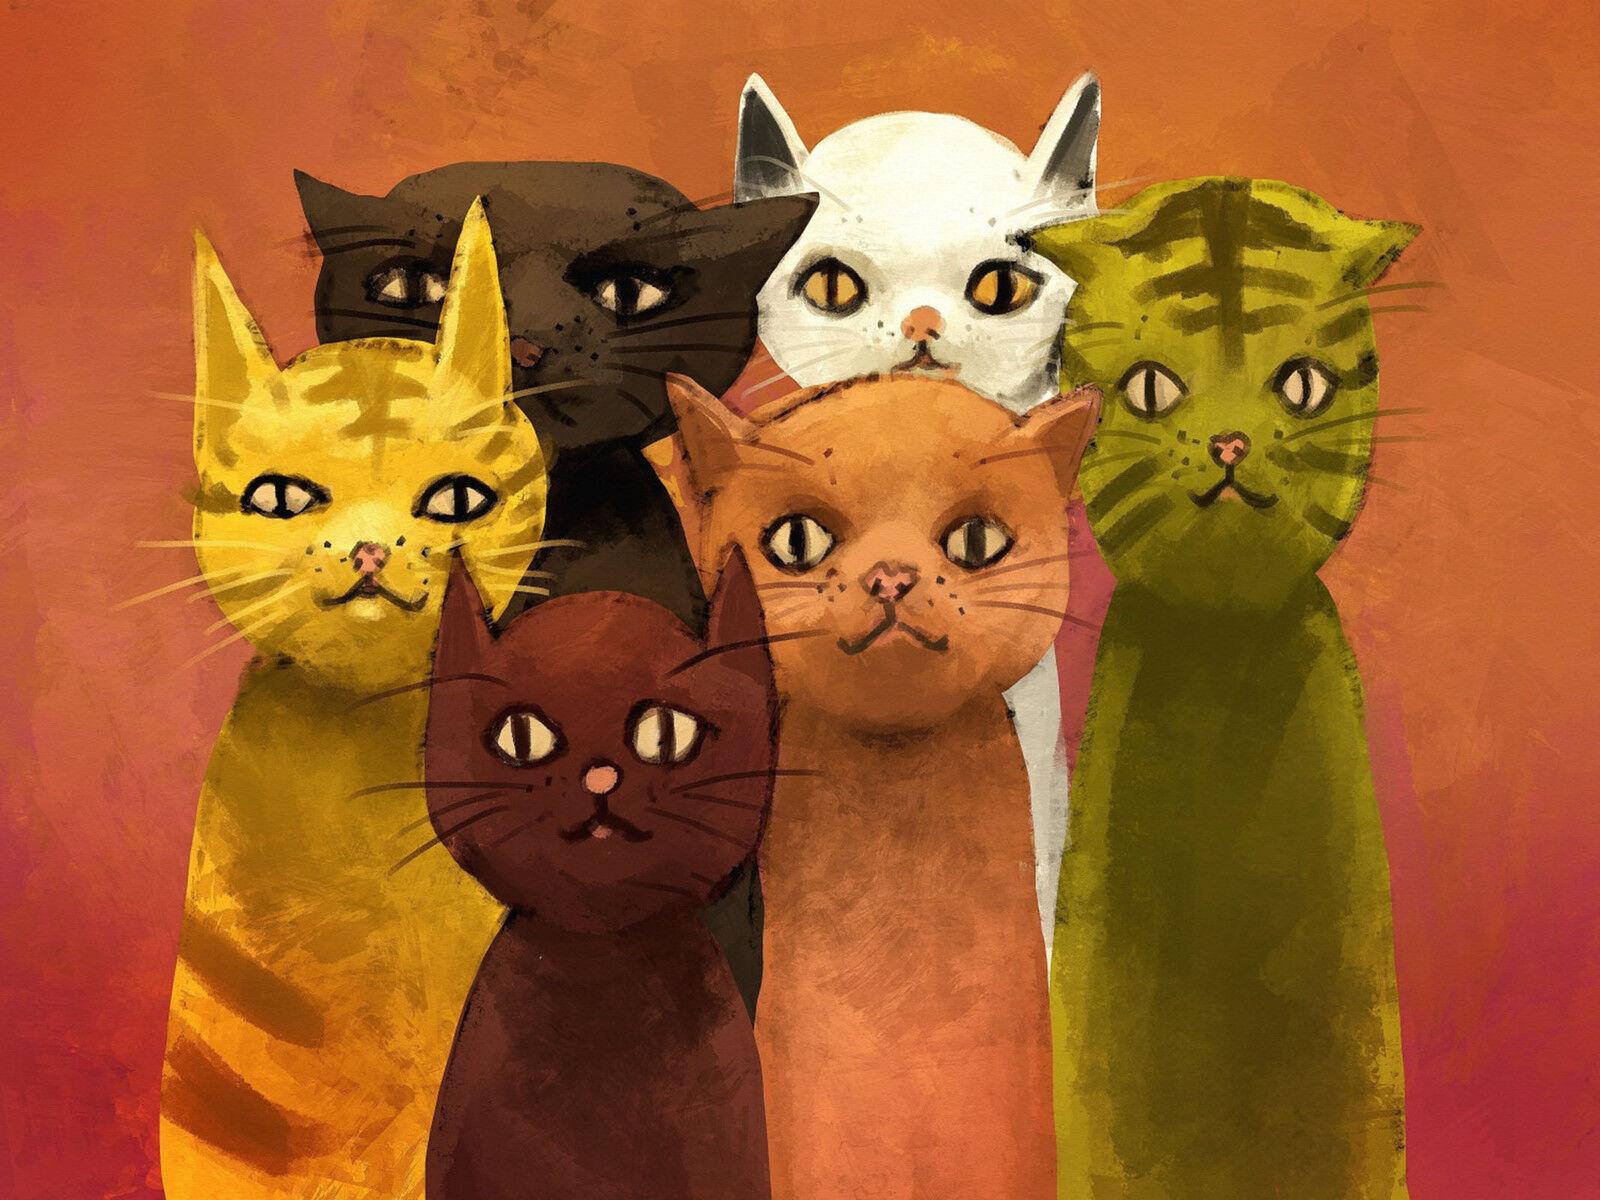 3D Nette Katze Fototapeten Wandbild Fototapete Bild Tapete Familie KinderMod